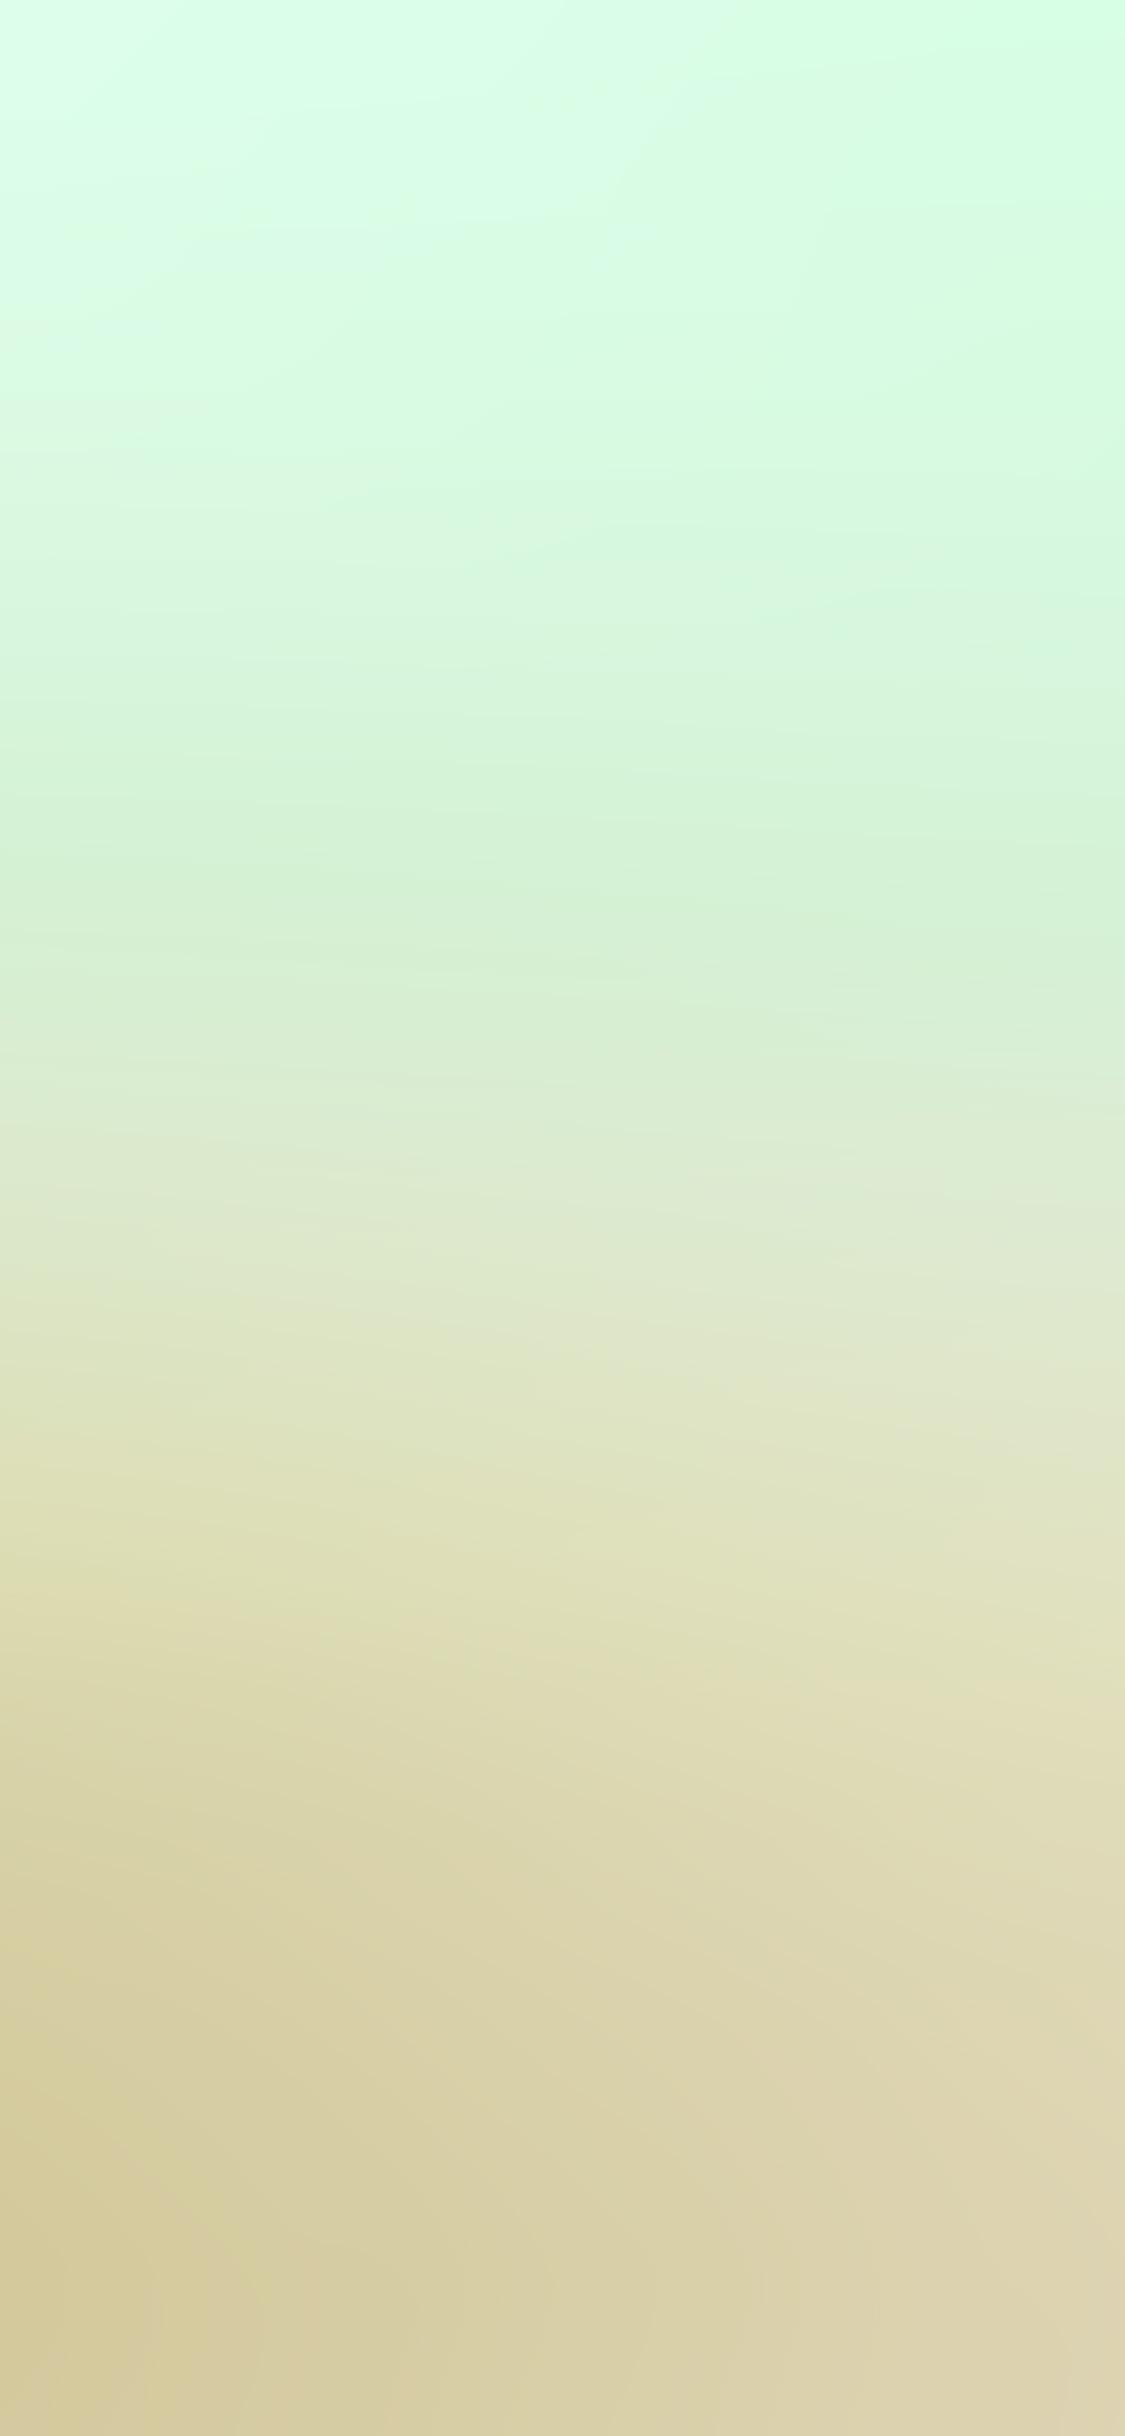 iPhonexpapers.com-Apple-iPhone-wallpaper-sm49-yellow-green-blur-gradation